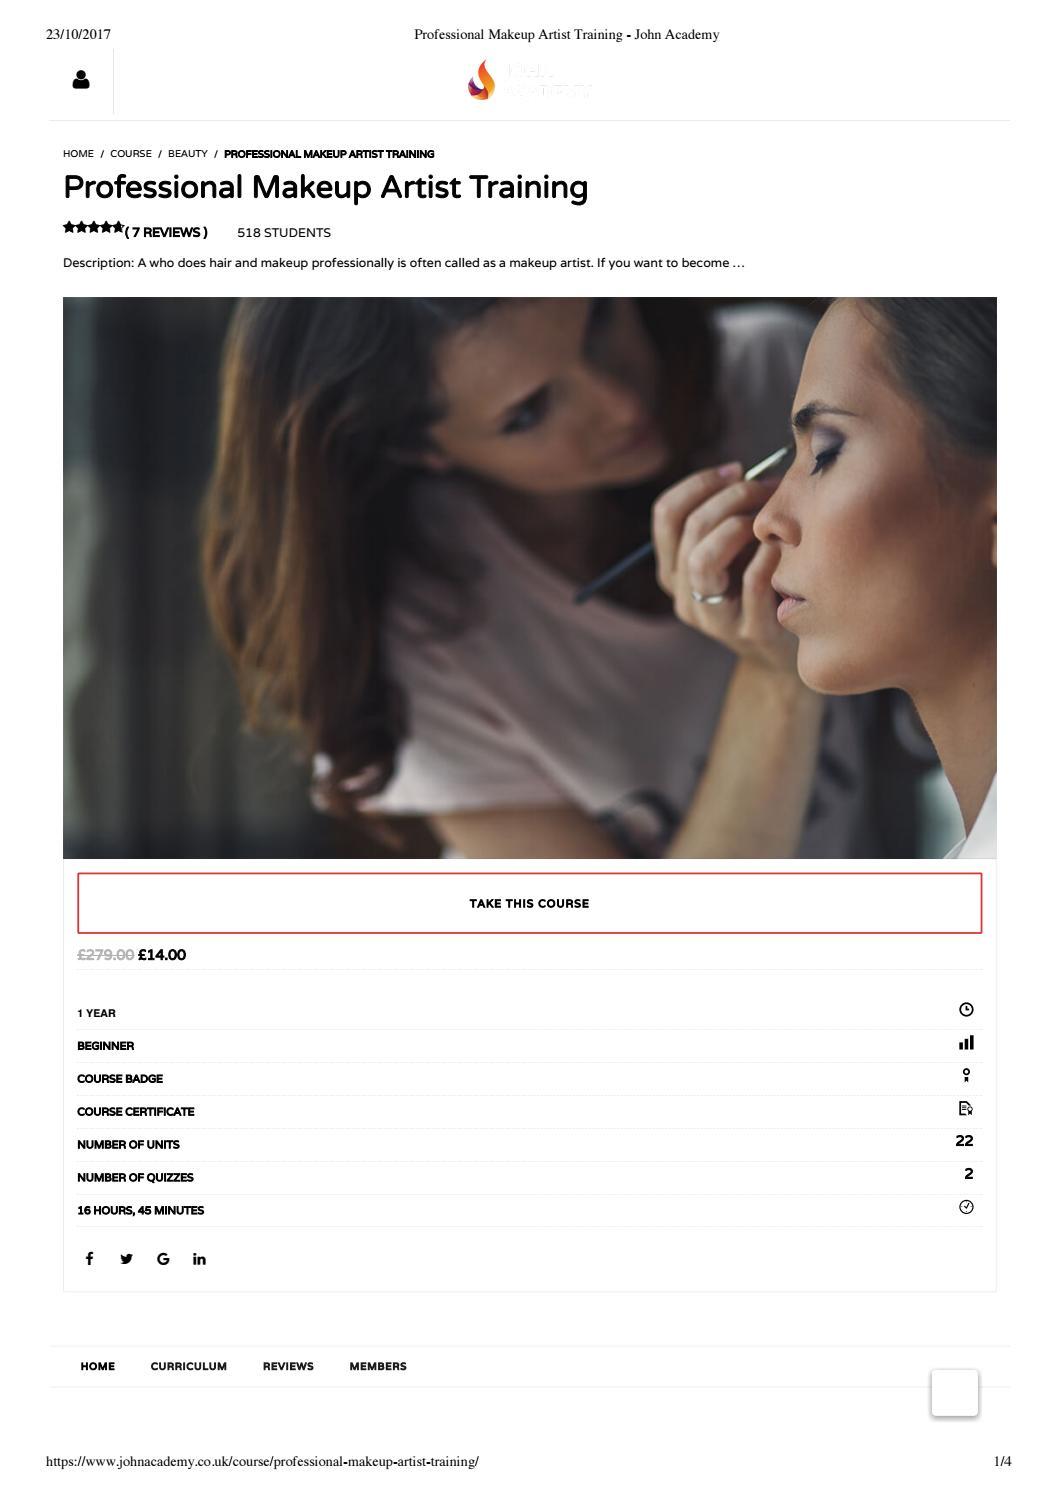 Professional Makeup Artist Training